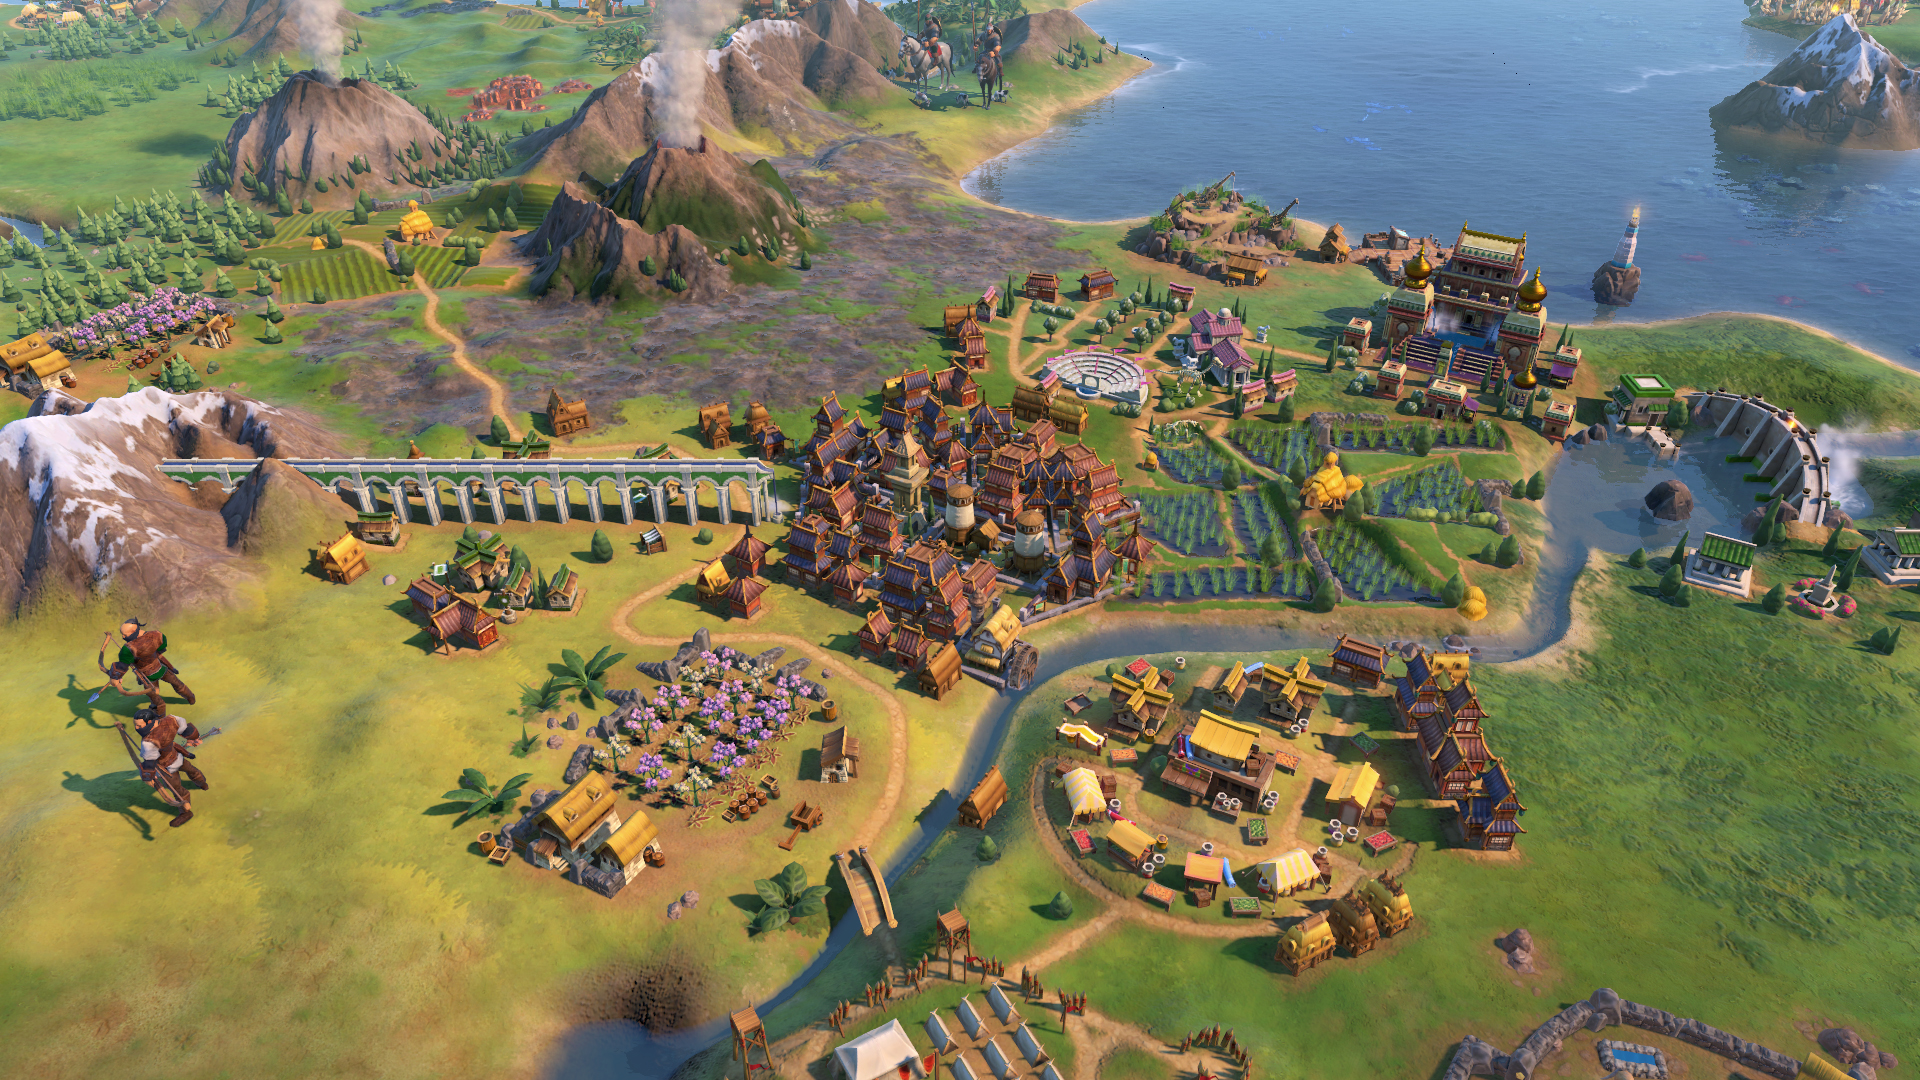 civilization 6, gathering storm, diplomatic favor